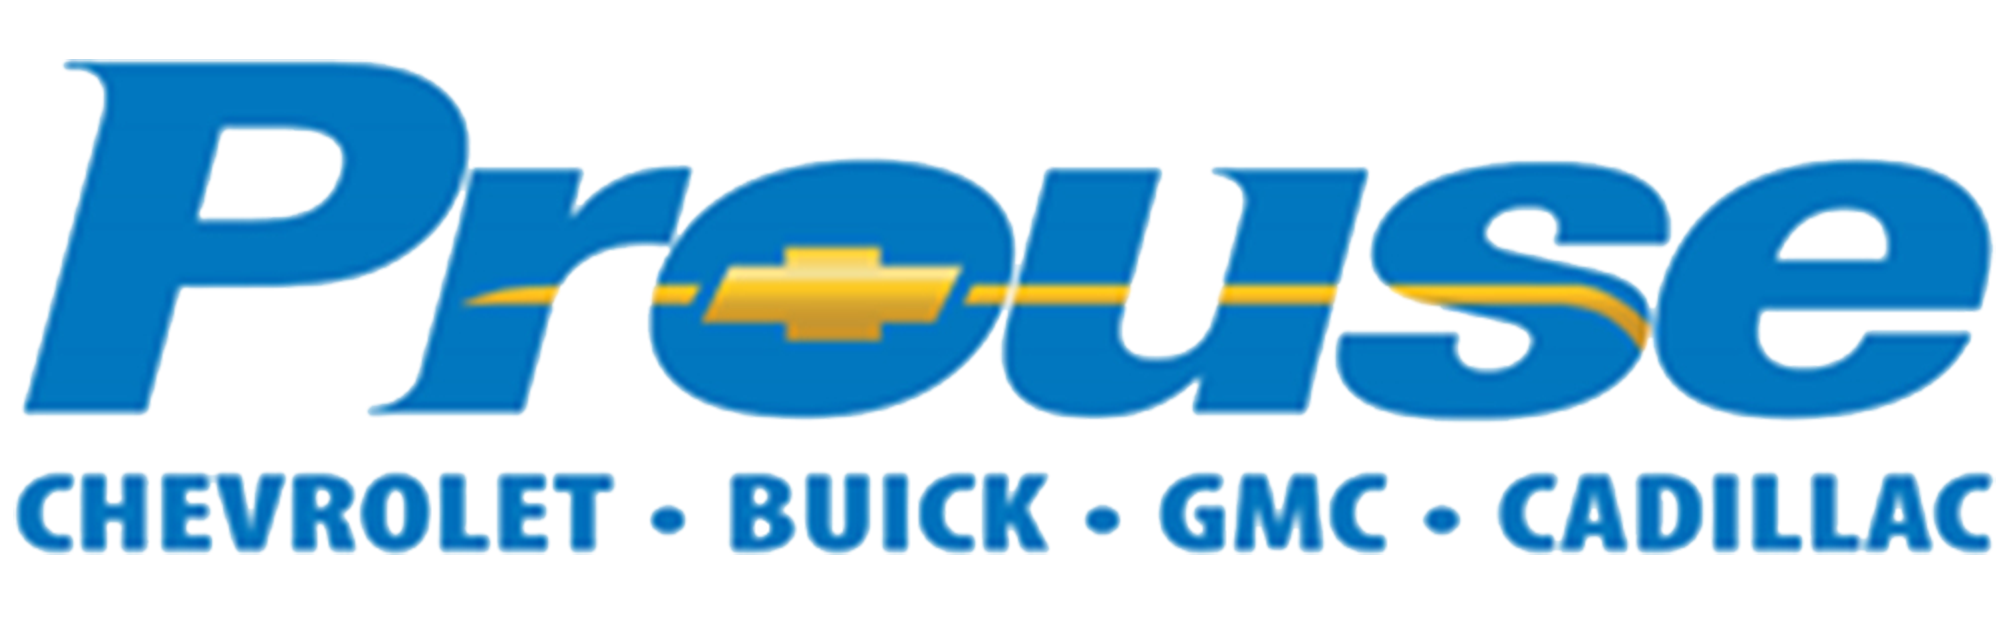 Prouse Chevrolet Buick Gmc Cadillac Ltd